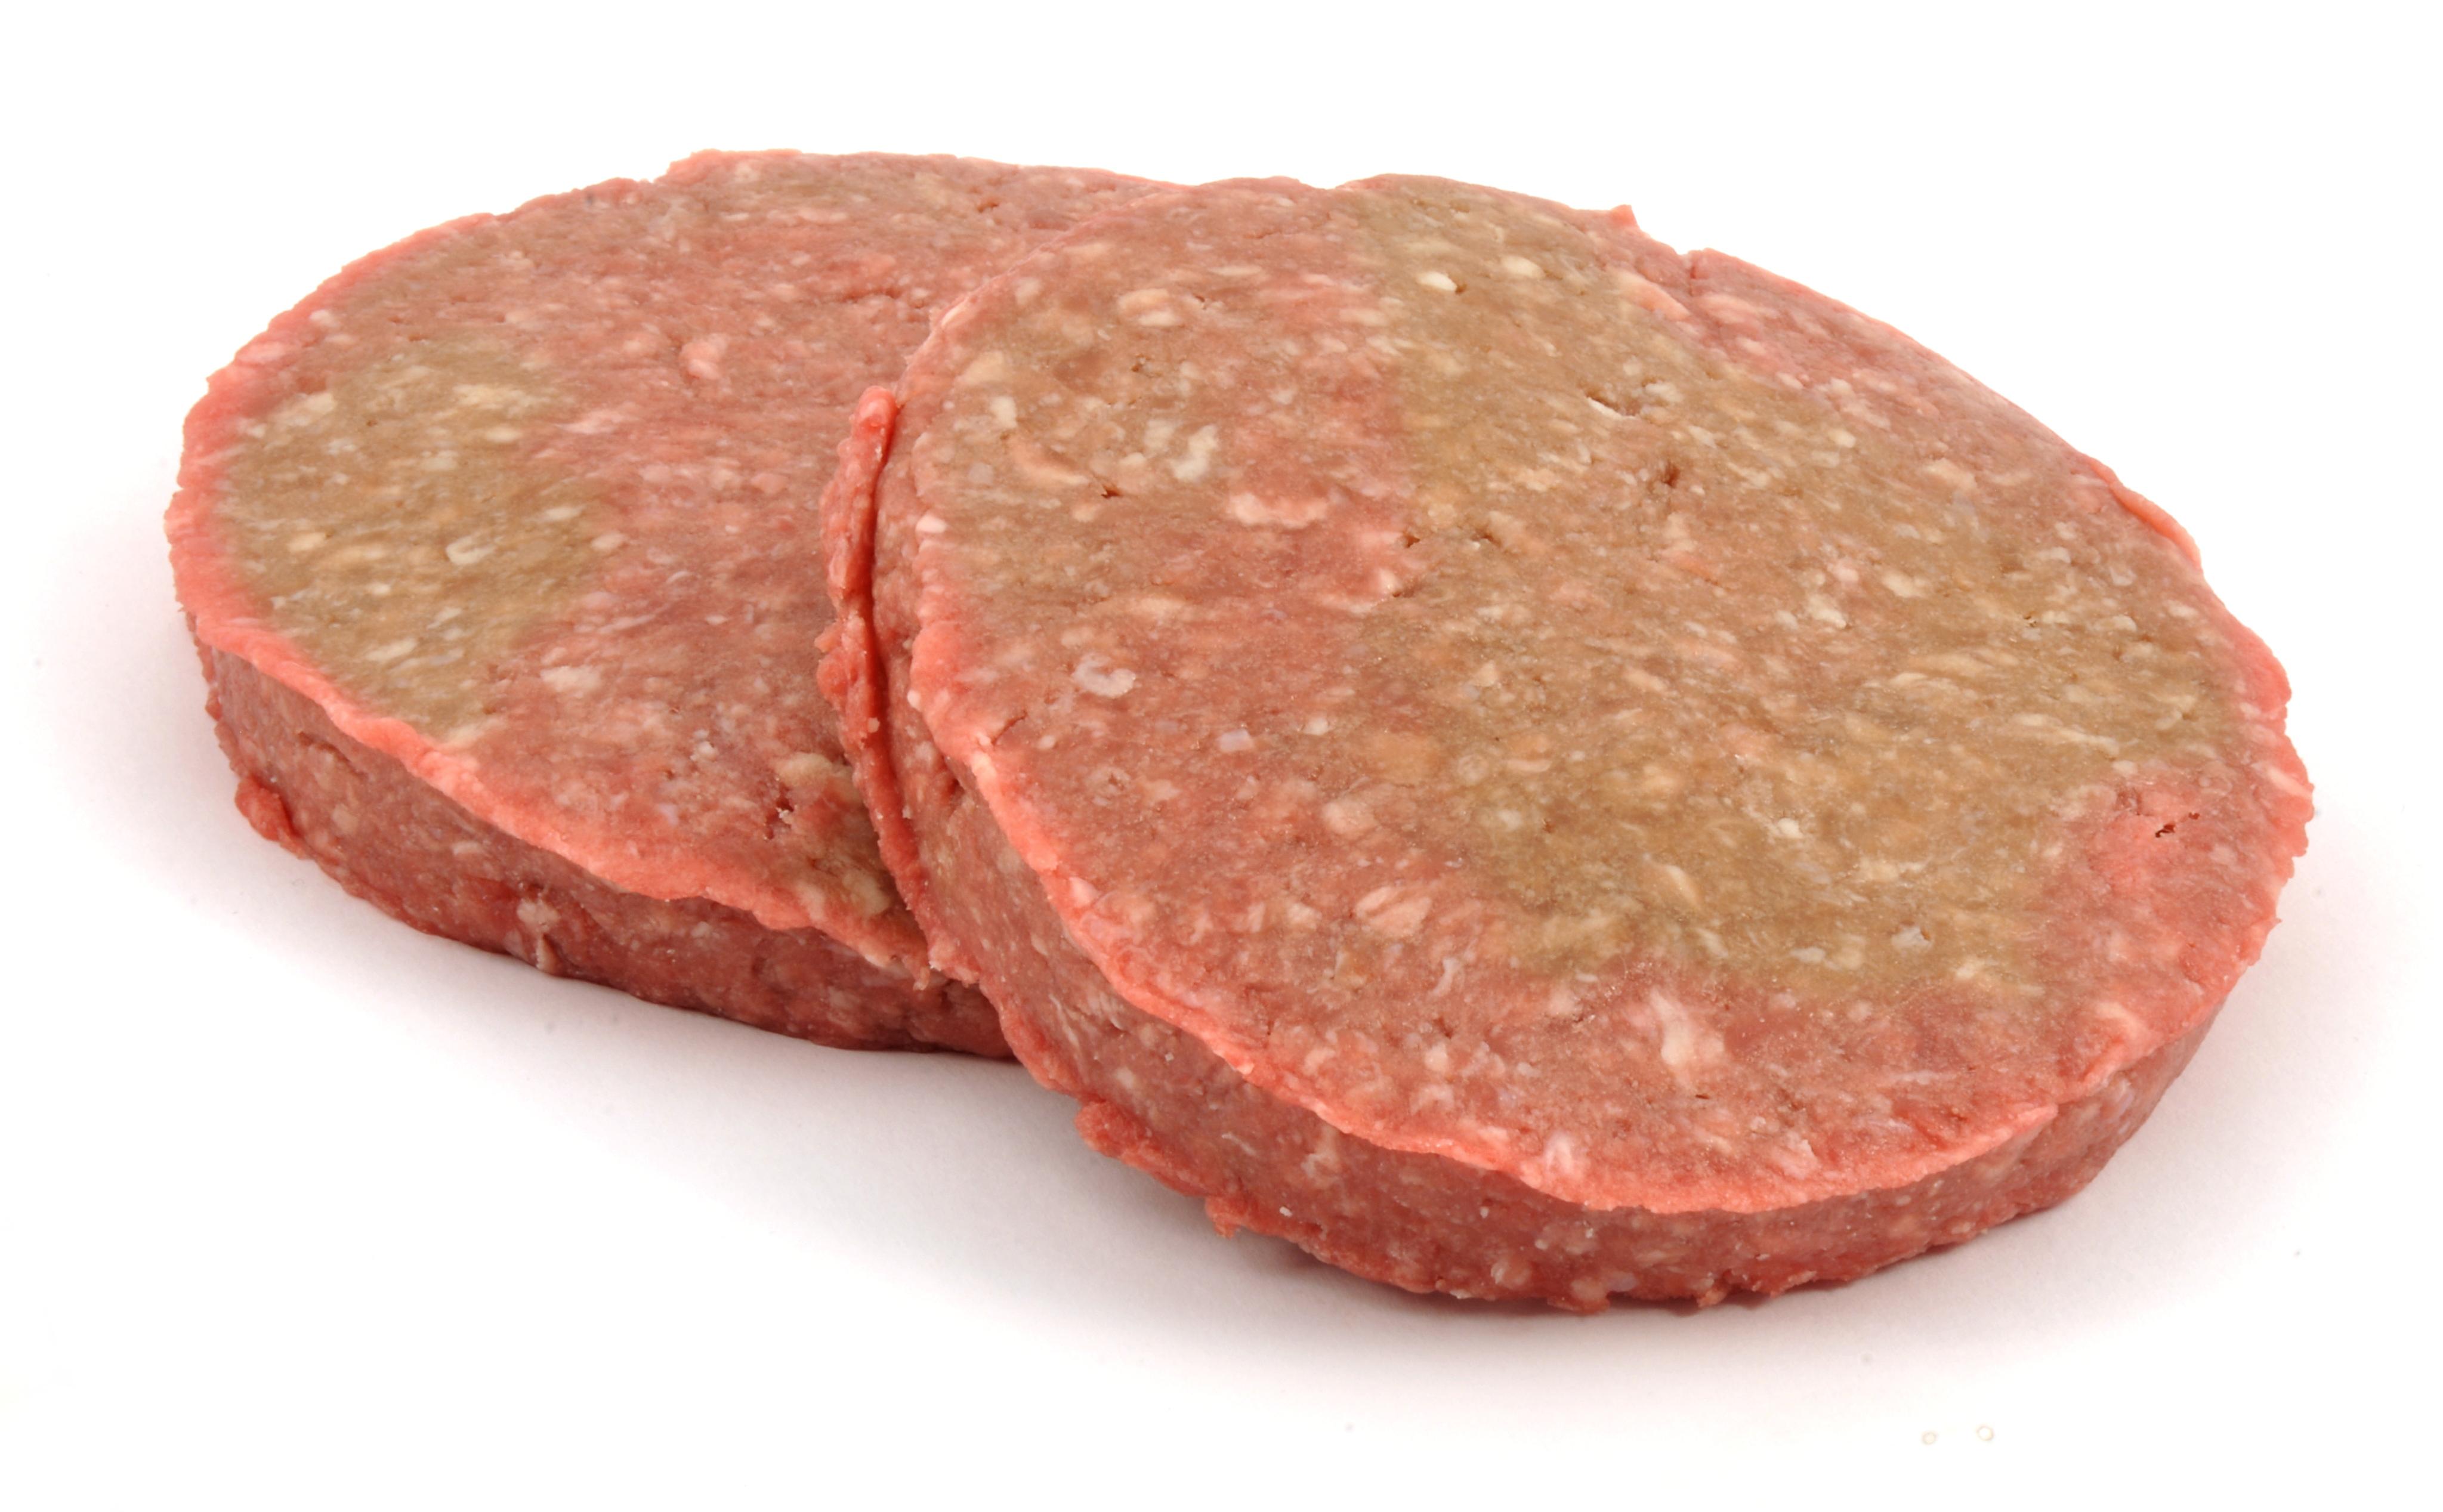 Dog Eat Raw Hamburger Meat